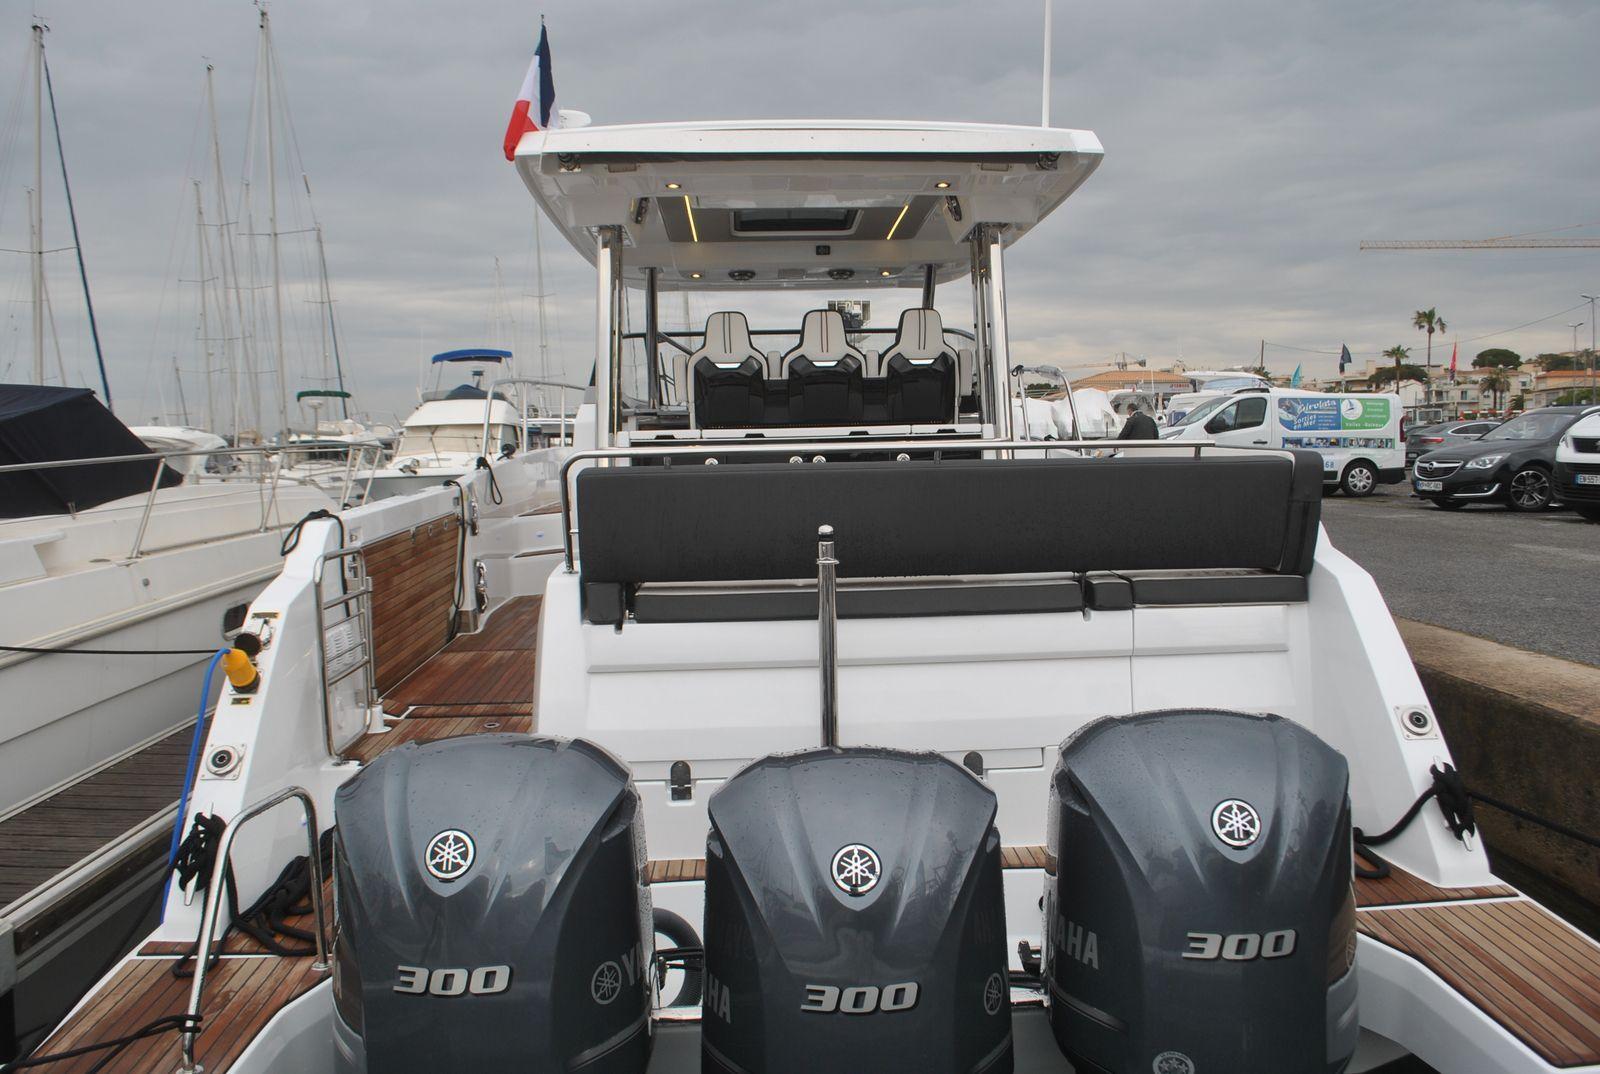 Hors-Bord - Essai du Jeanneau Cap Camarat 12.5 WA 2020